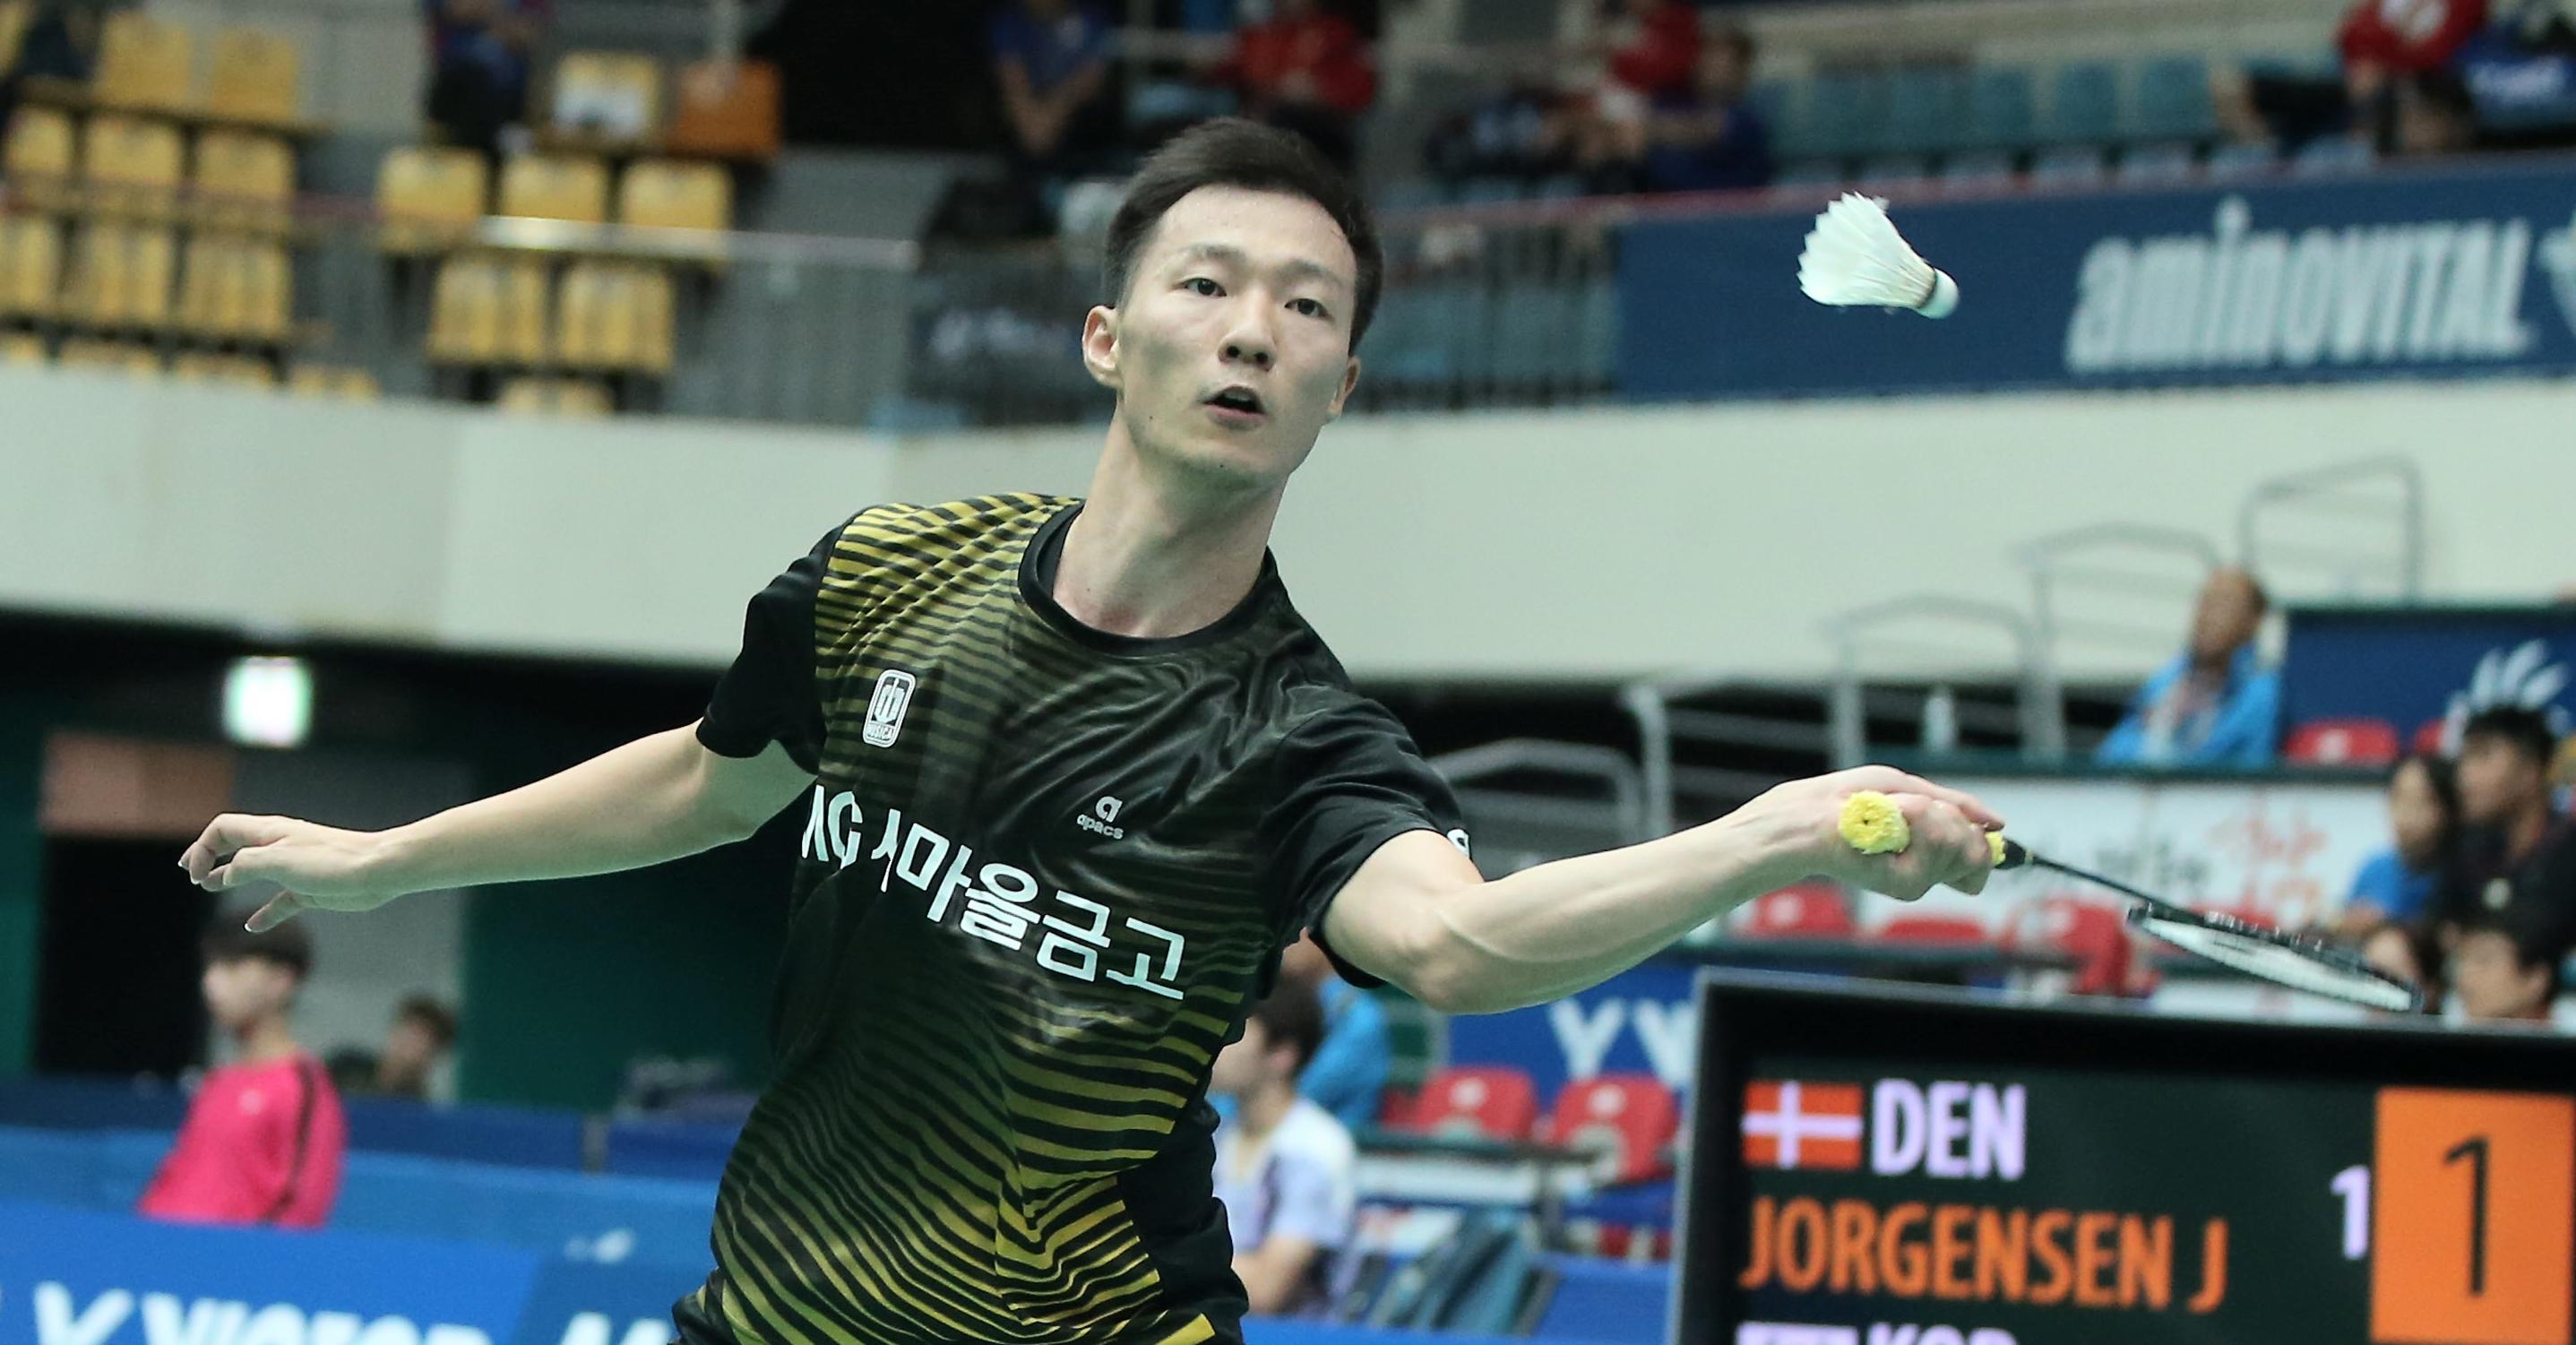 Lee Rewinds the Clock: Victor Korea Open 2016 – Day 3